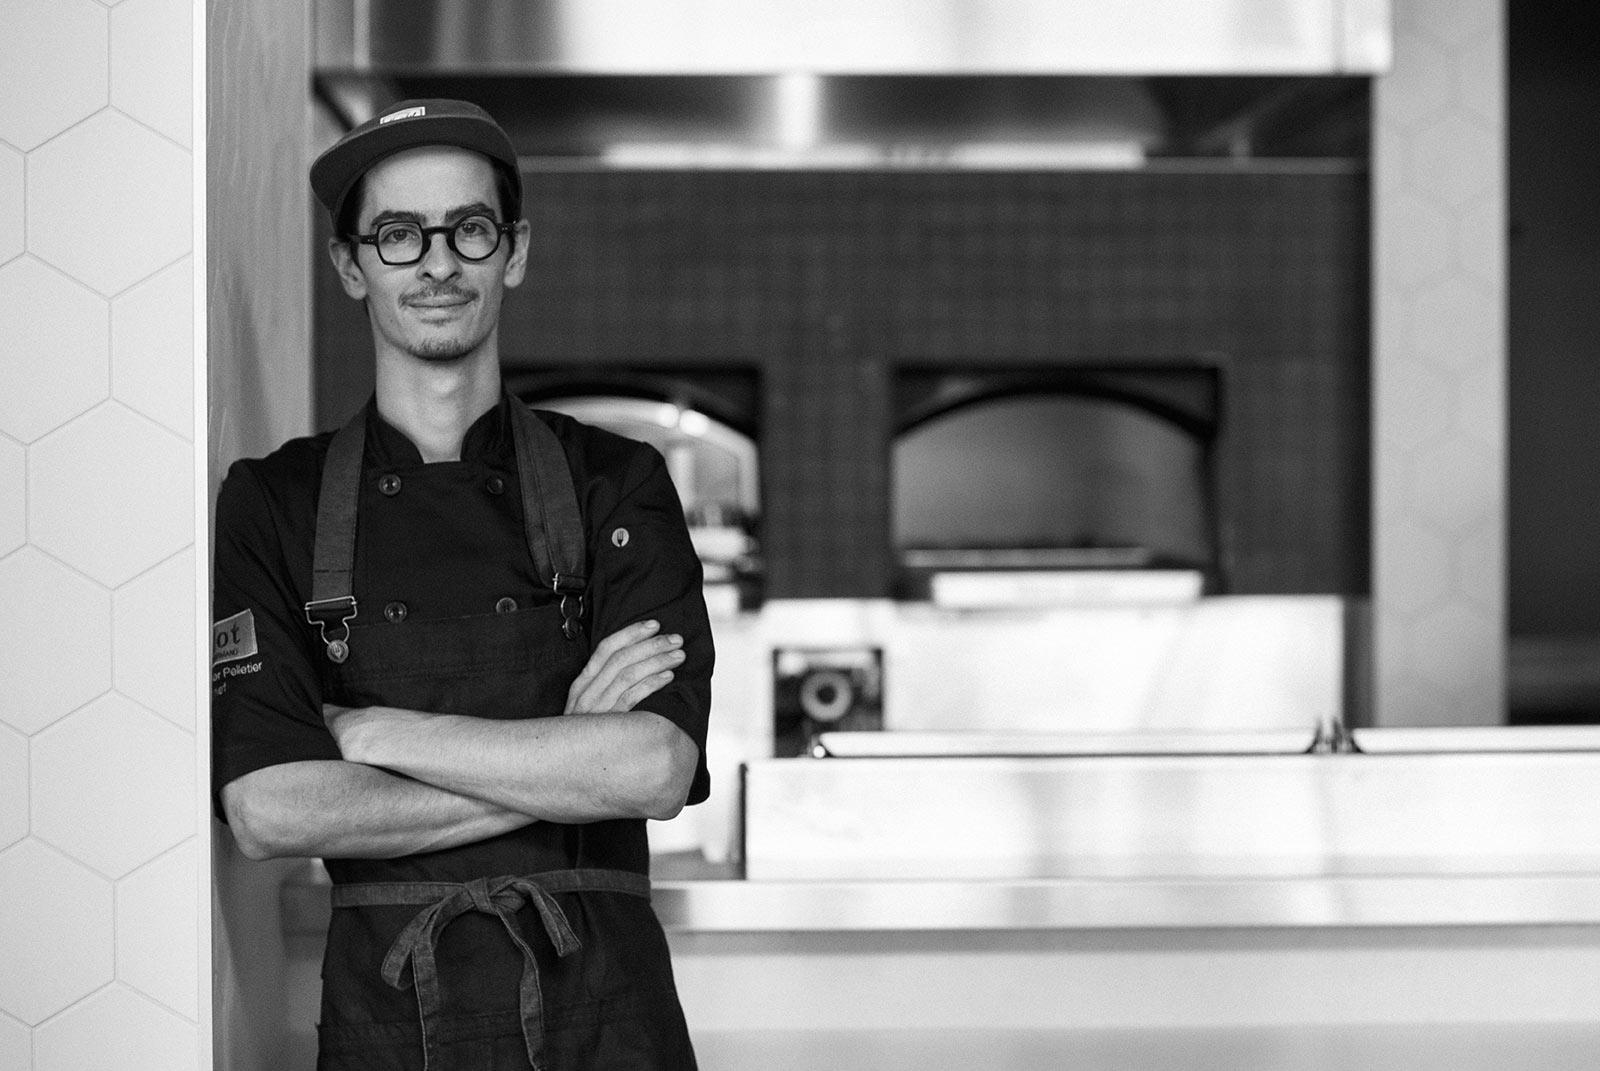 L'îlot restaurant - Cuisinier